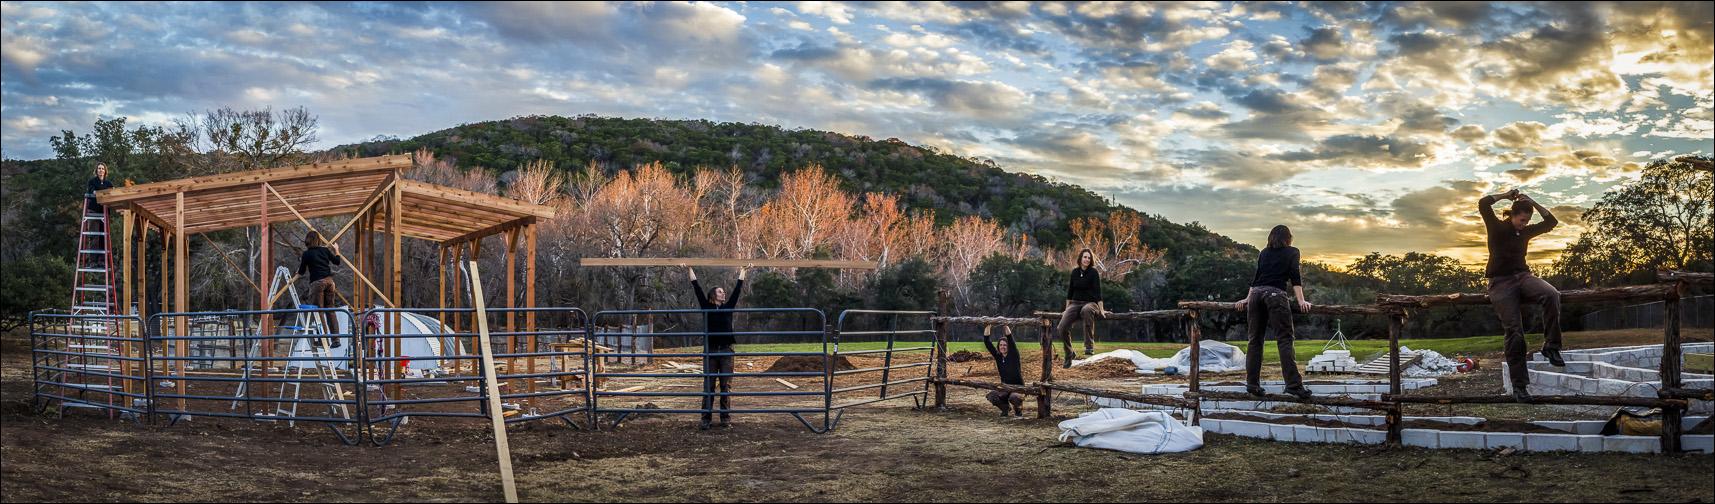 Kimberly Grabowski at the Travaasa Farm